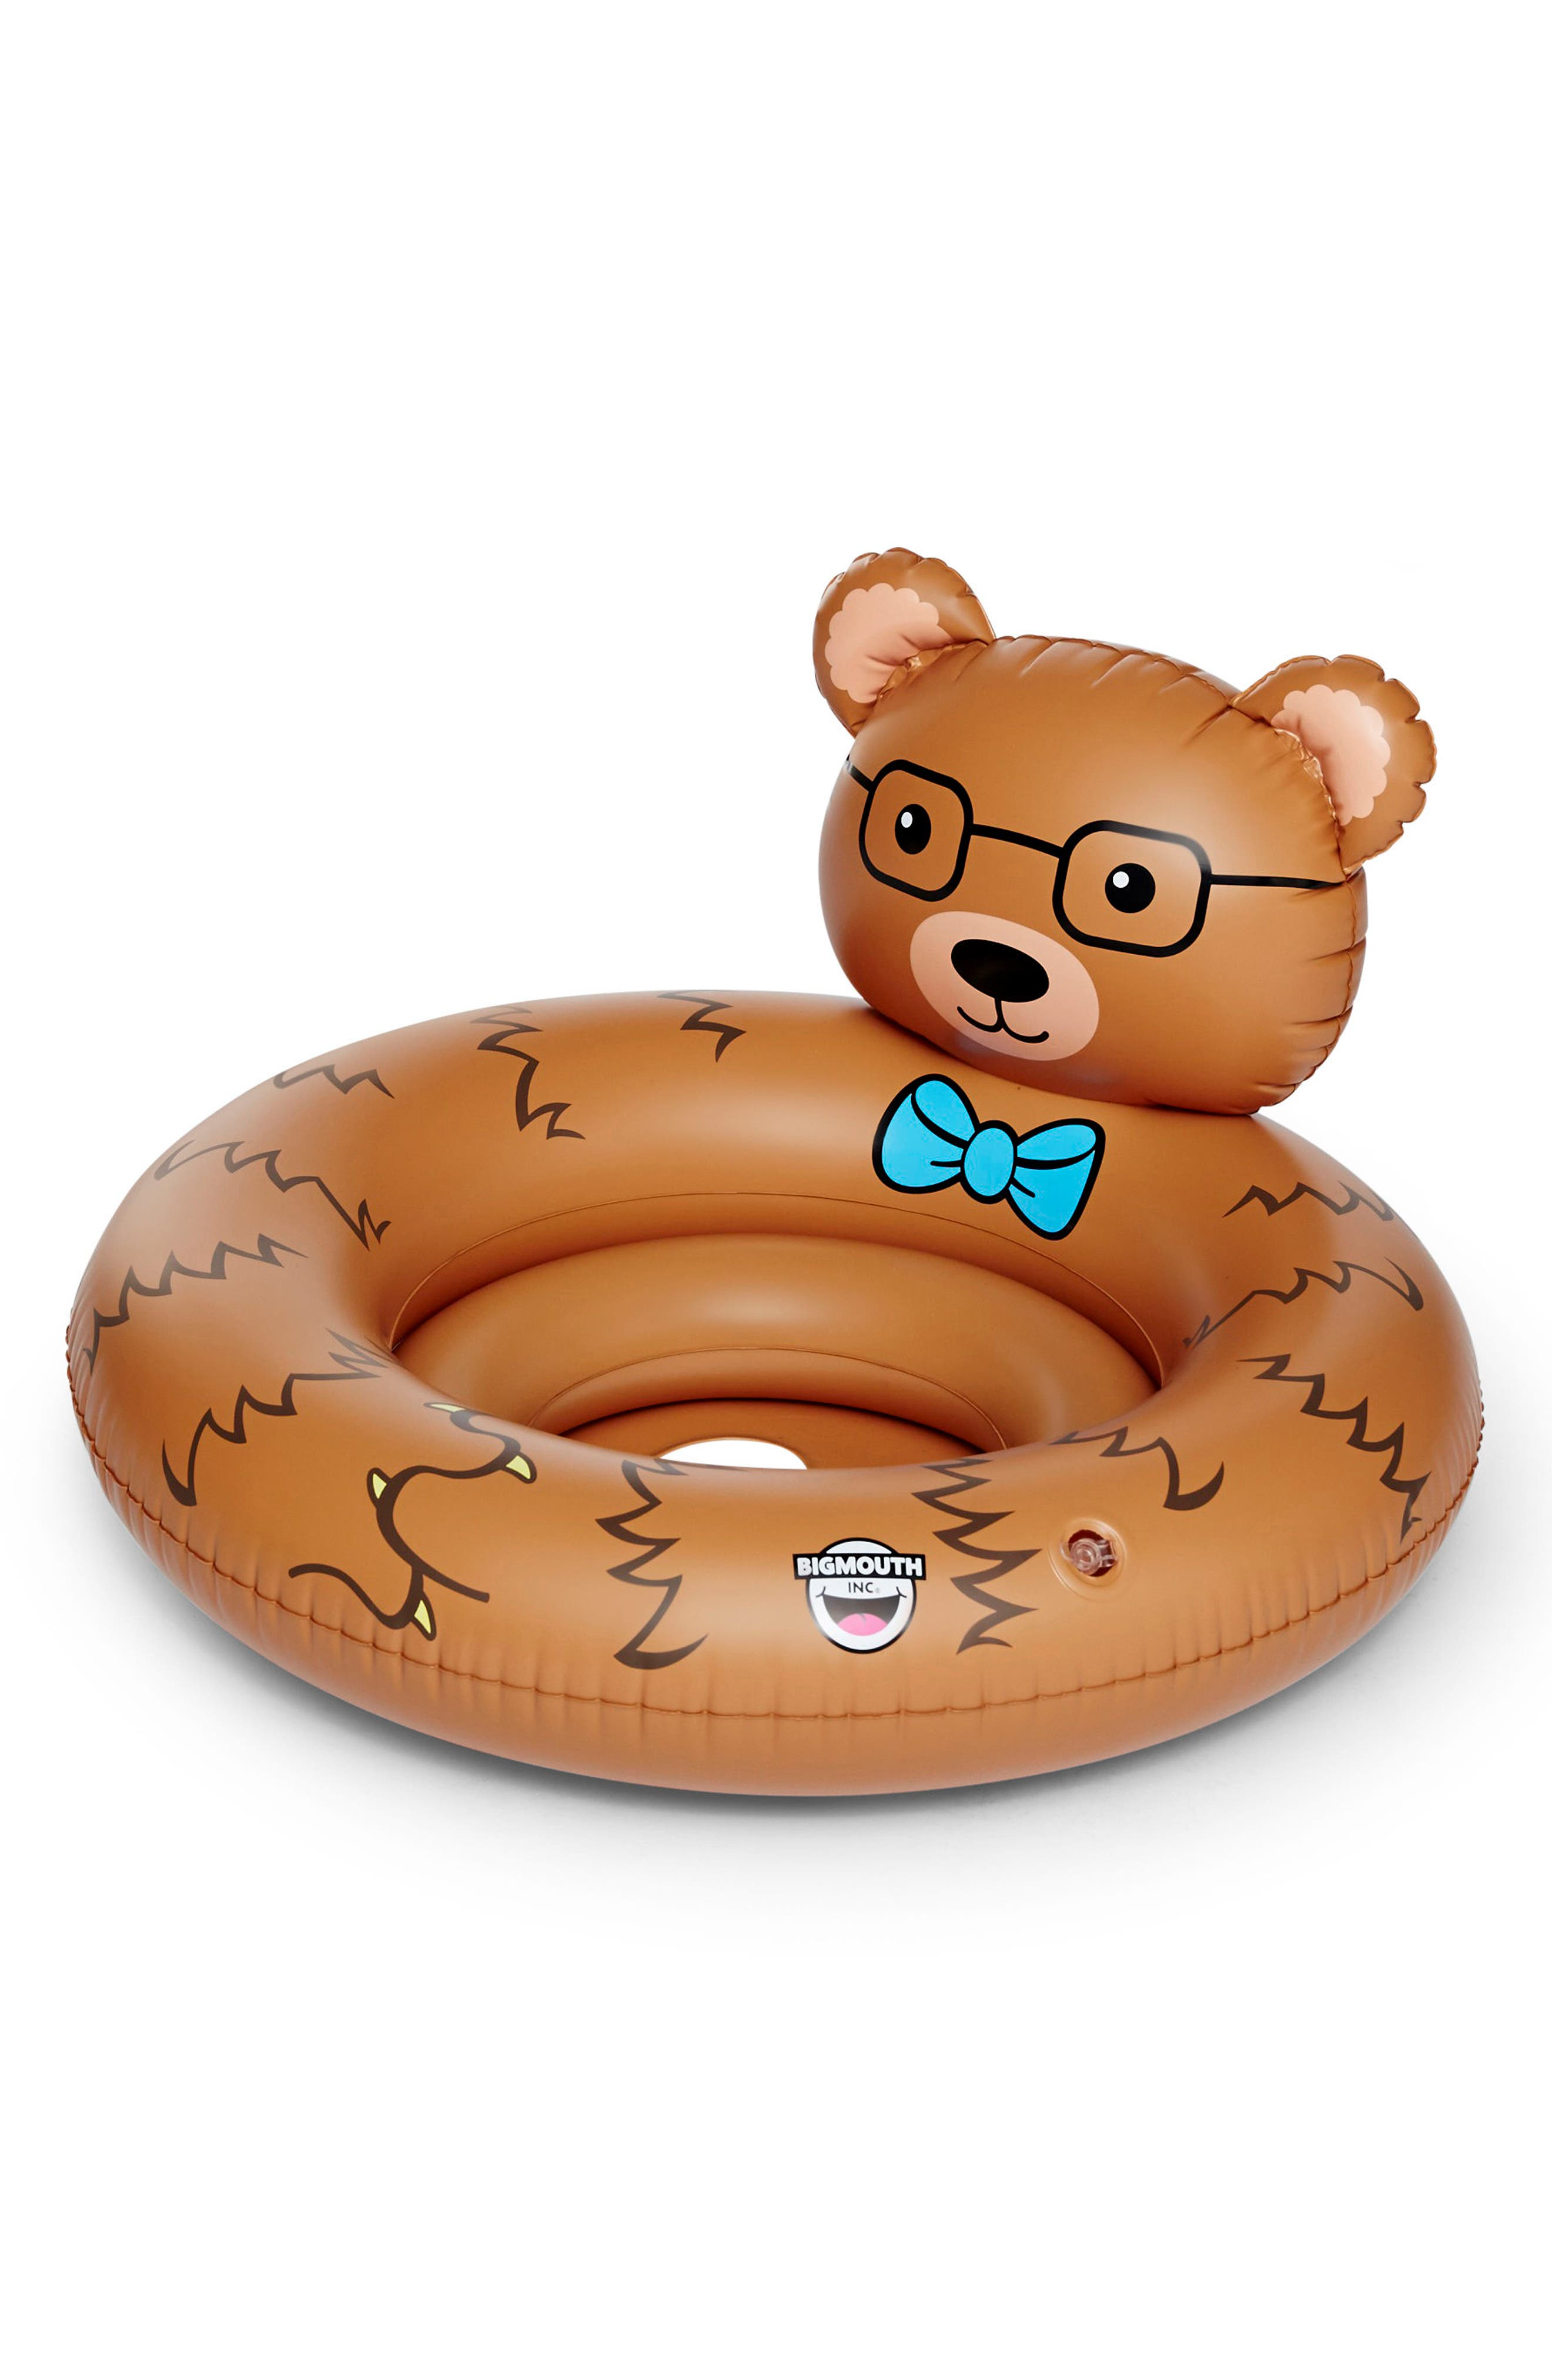 Bear Hug Pool Float,                             Main thumbnail 1, color,                             200